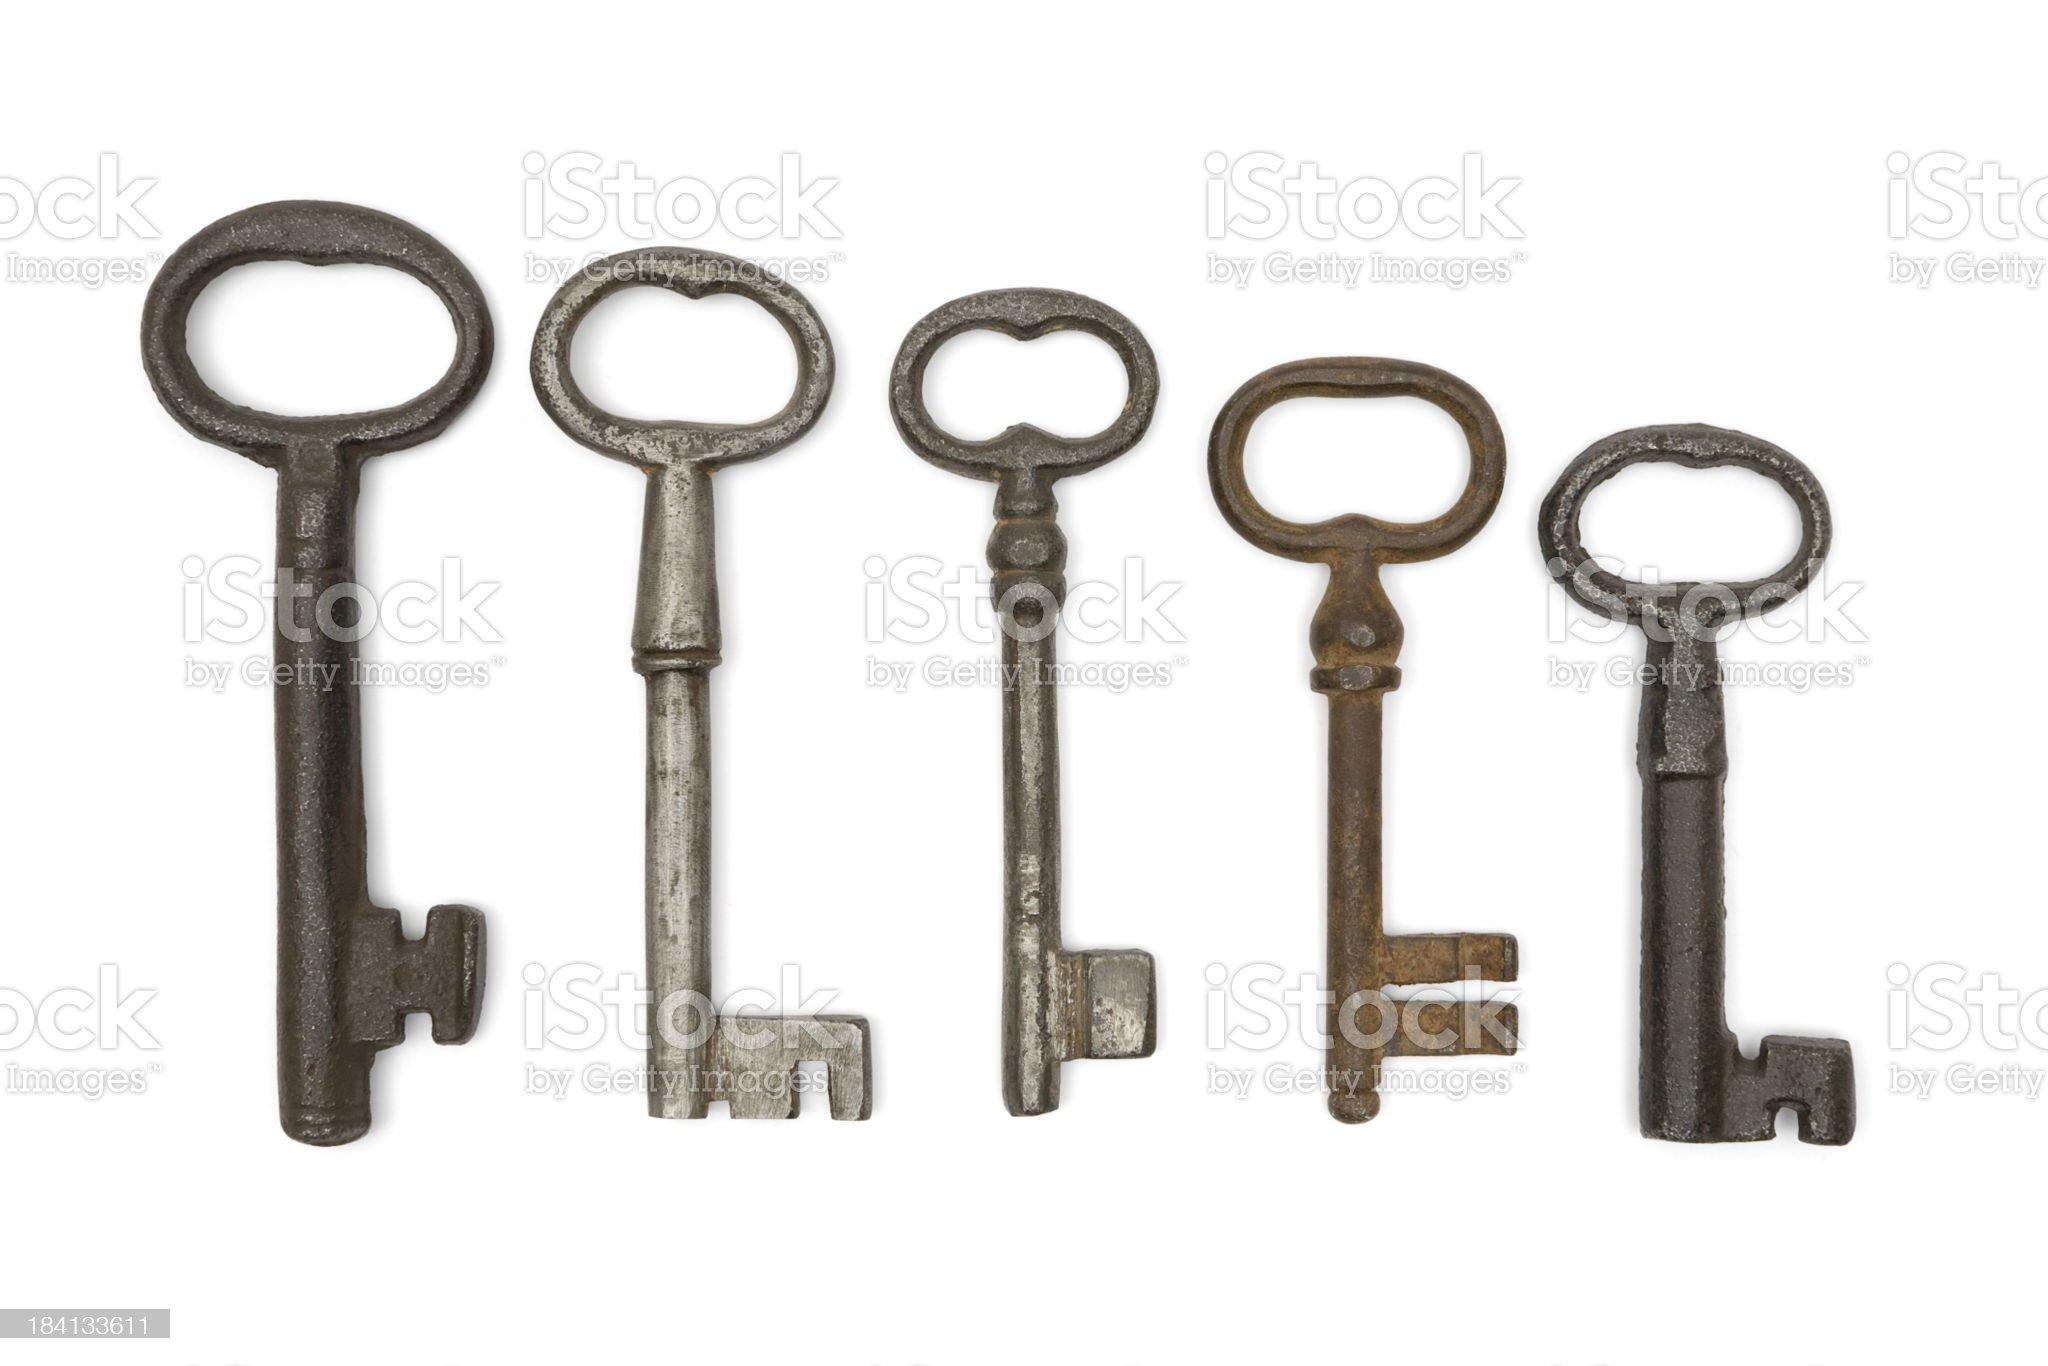 Five Old Keys royalty-free stock photo